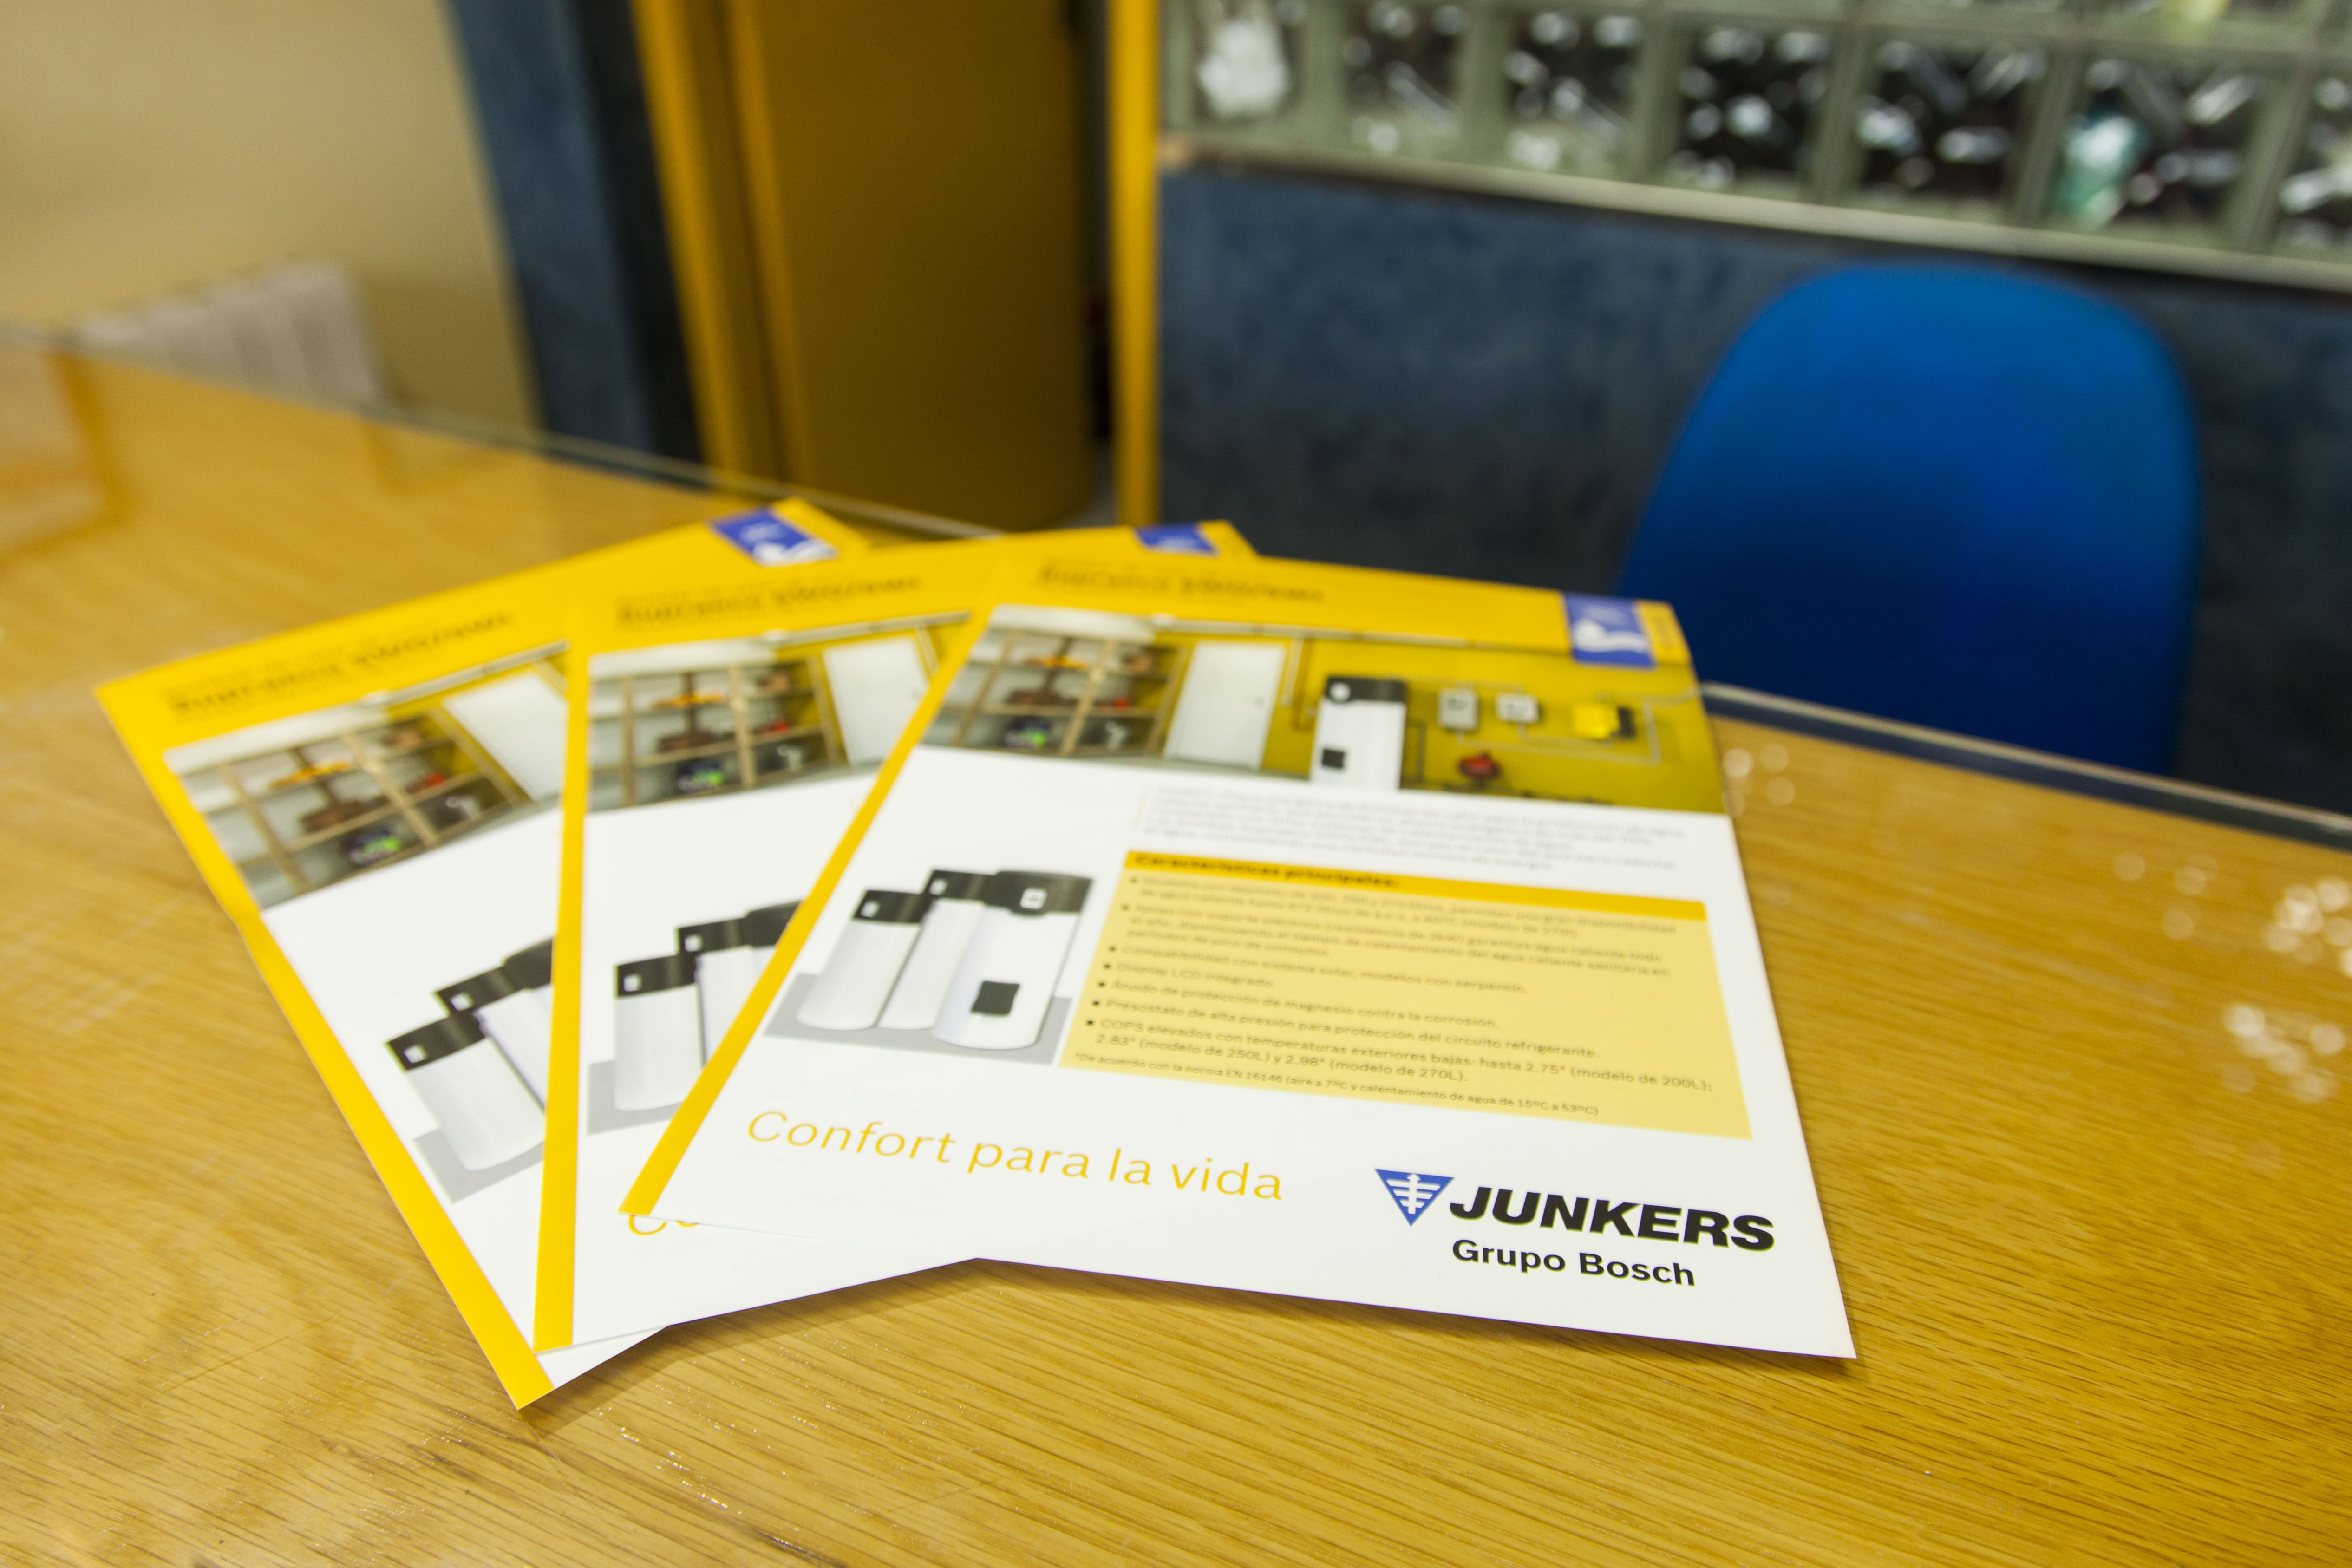 Calderas Junkers, Grupo Bosch en Burgos